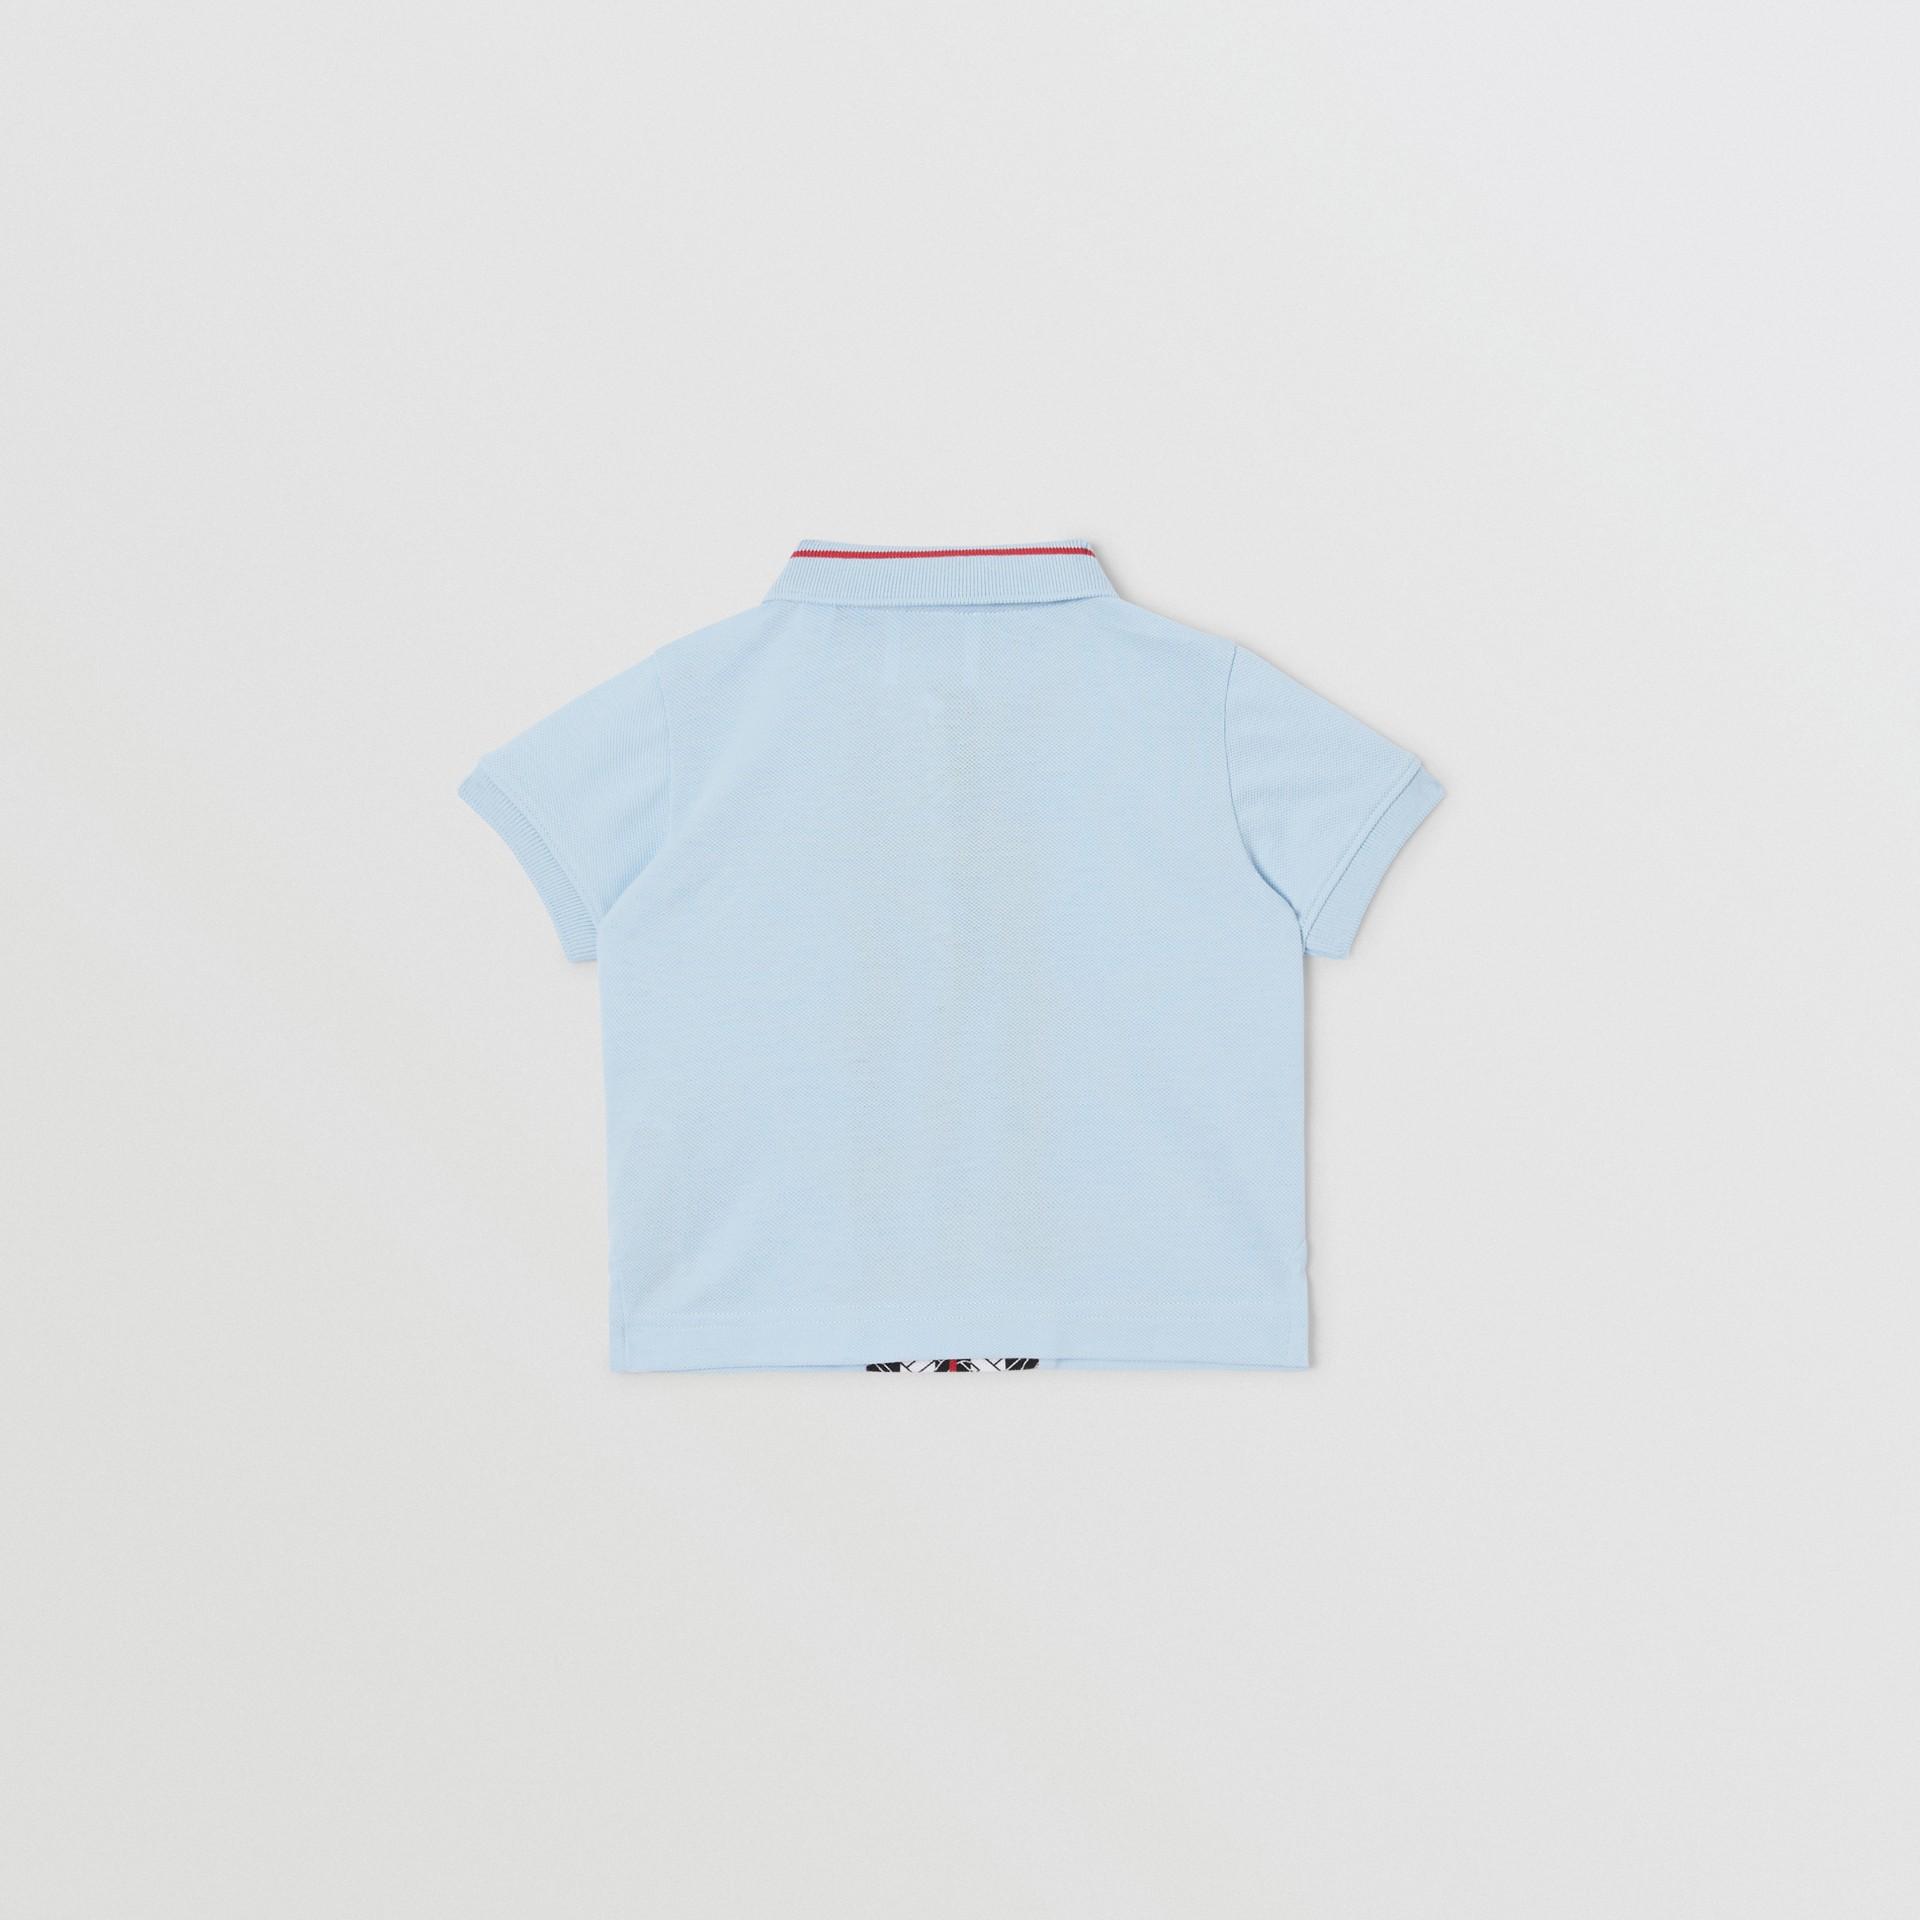 Monogram Stripe Print Cotton Piqué Polo Shirt in Pale Blue - Children | Burberry - gallery image 3